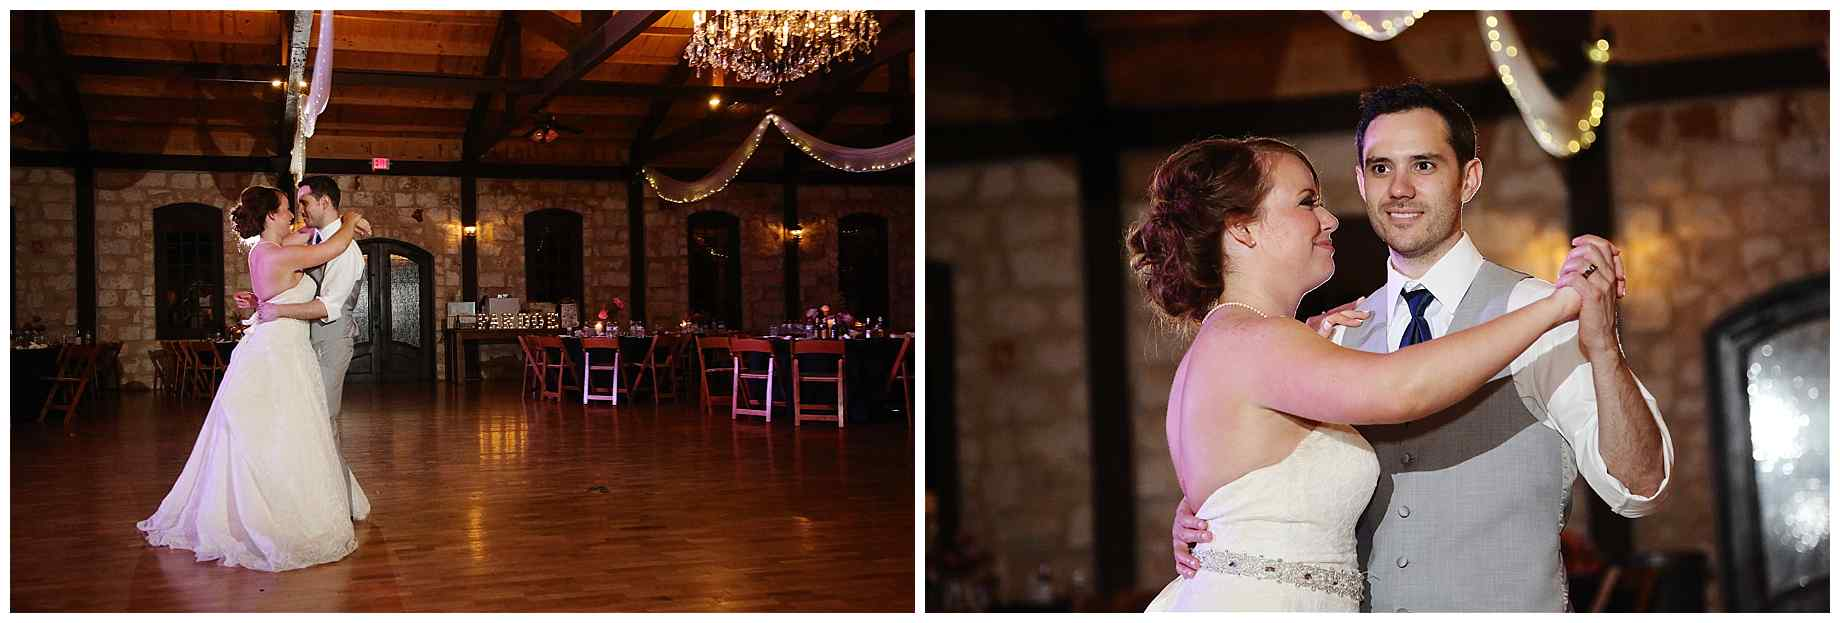 poetry-springs-wedding-photos-034